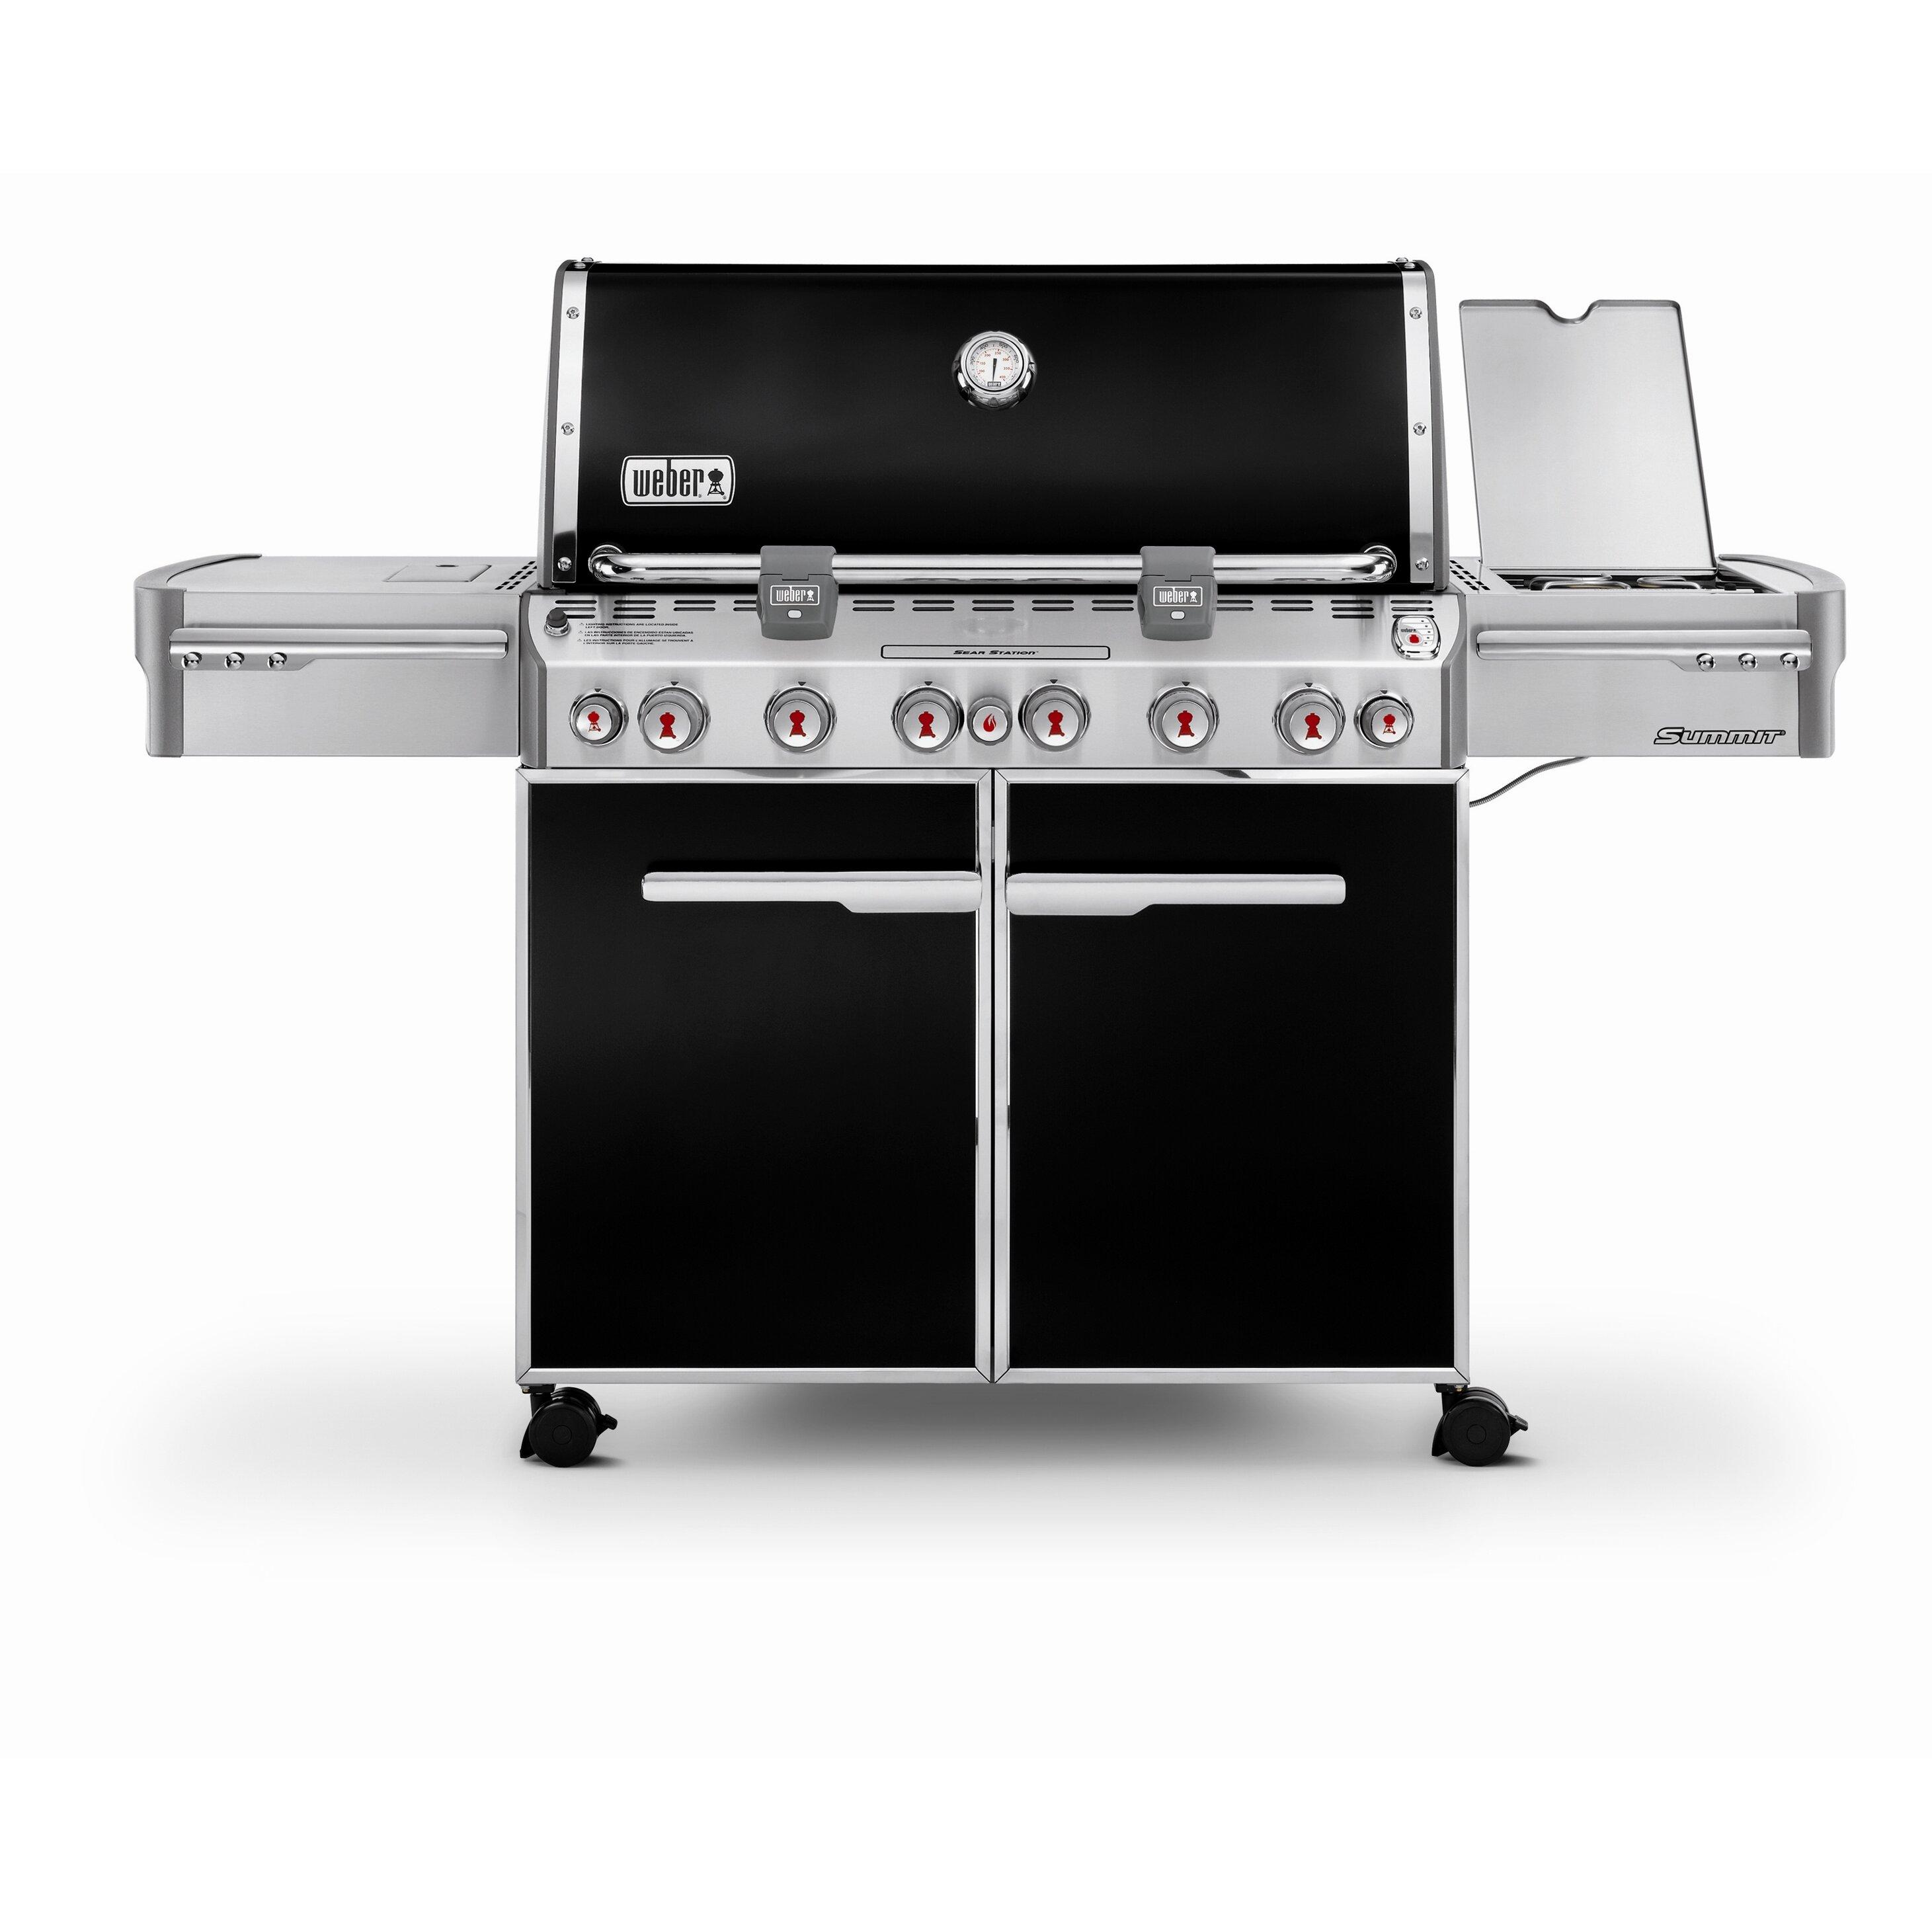 summit e 670 gas grill wayfair. Black Bedroom Furniture Sets. Home Design Ideas